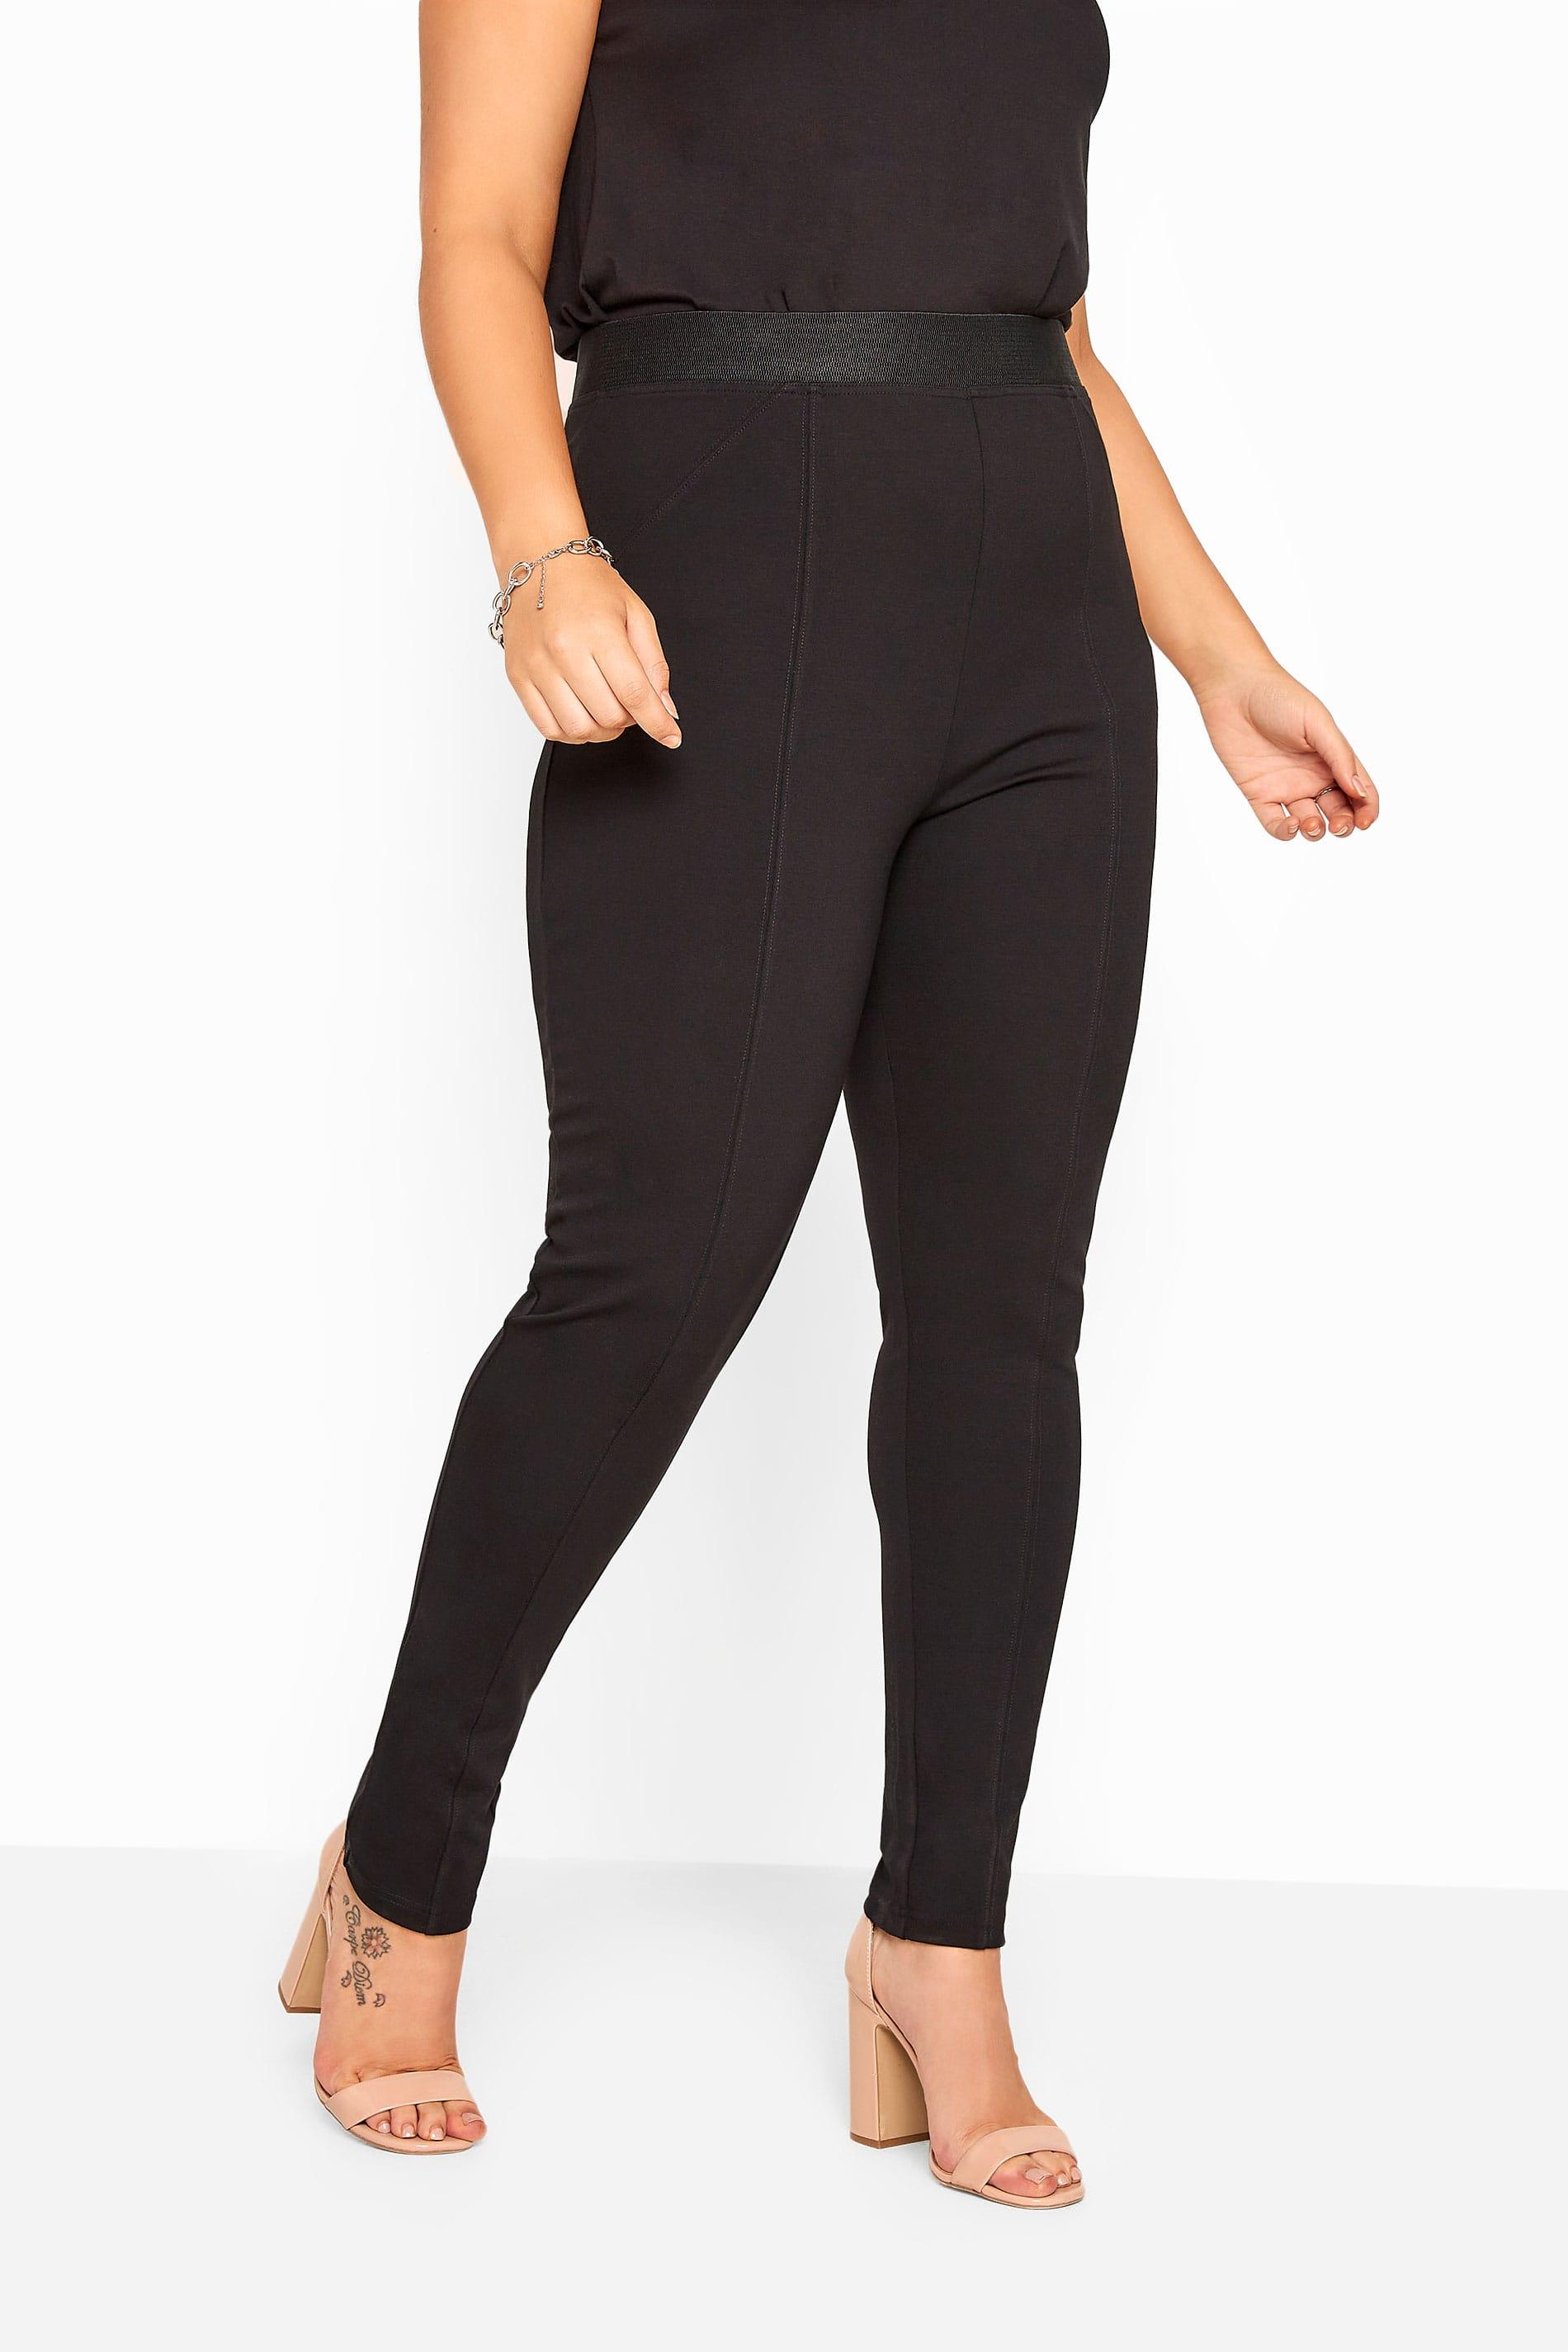 Bestseller Black Ponte Premium Stretch Trousers_9e9d.jpg